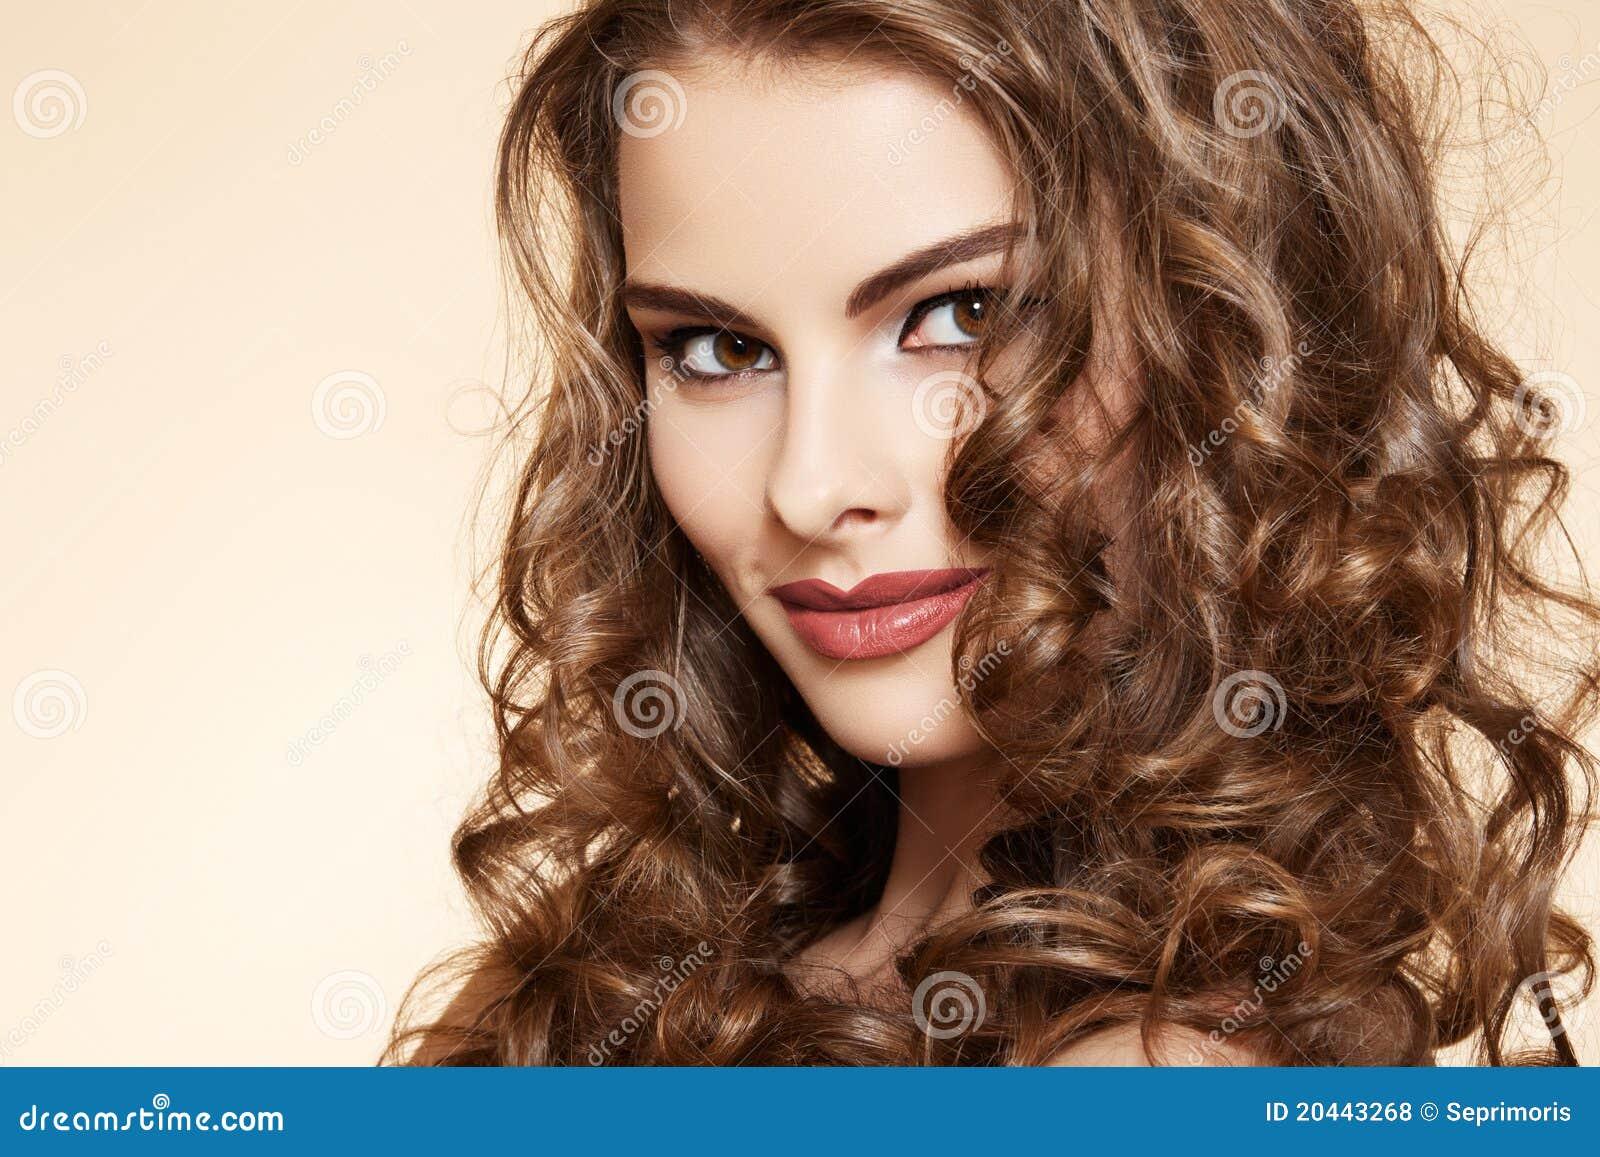 Beauty closeup portrait of pretty woman model with retro pinup make